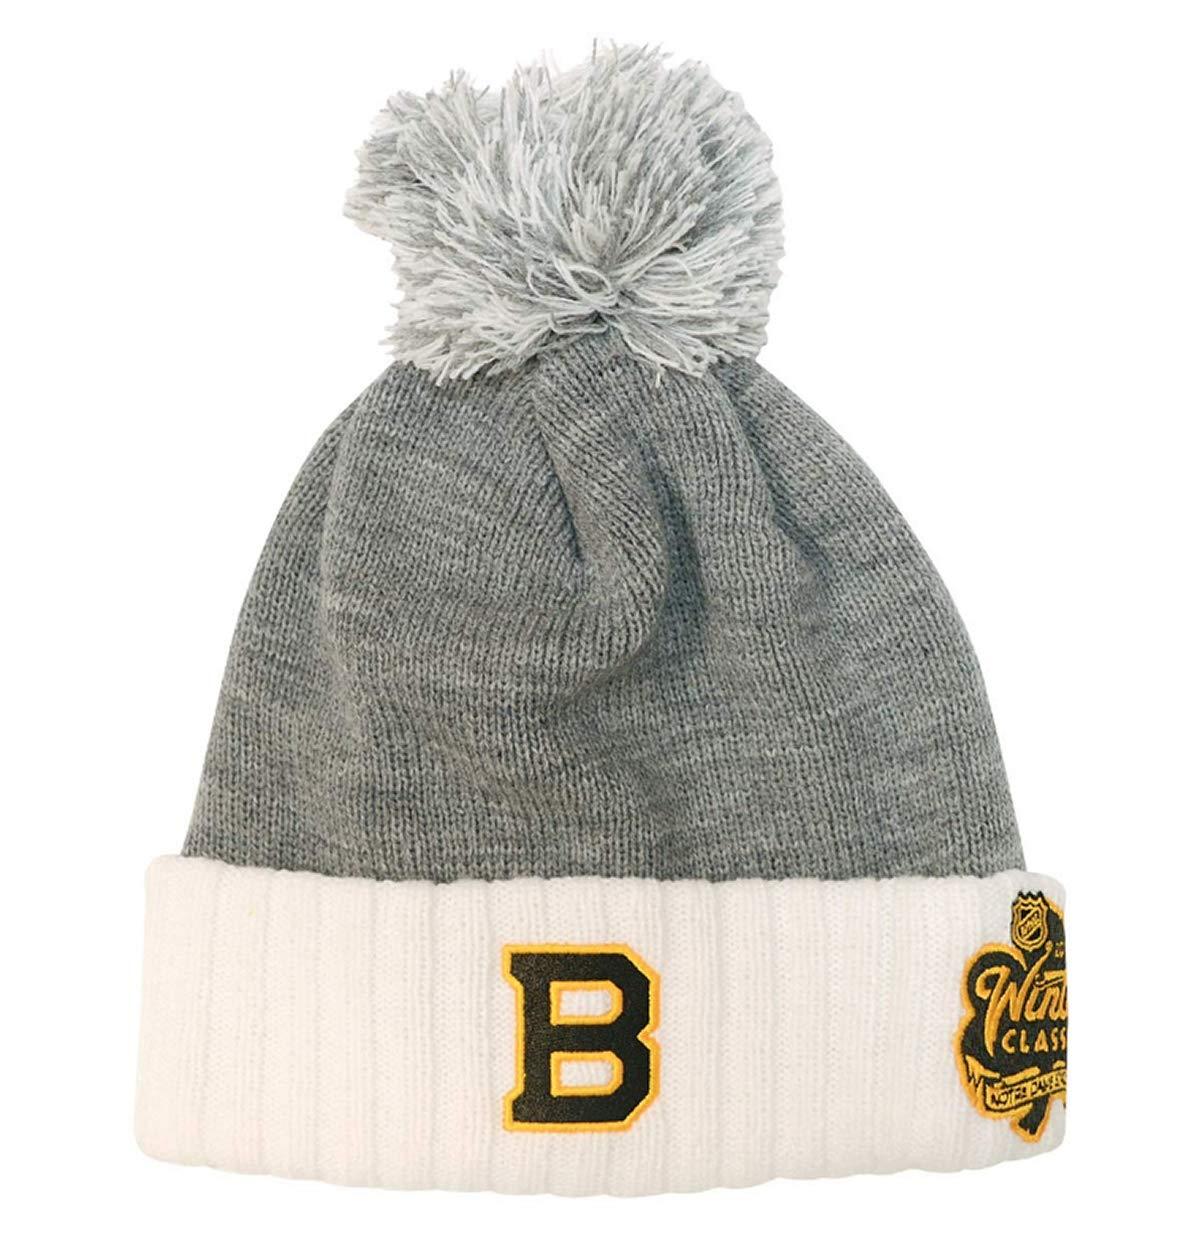 Amazon.com   adidas Boston Bruins 2019 Winter Classic Cuffed Pom Knit Hat  ...   Sports   Outdoors 72fbd2c2695